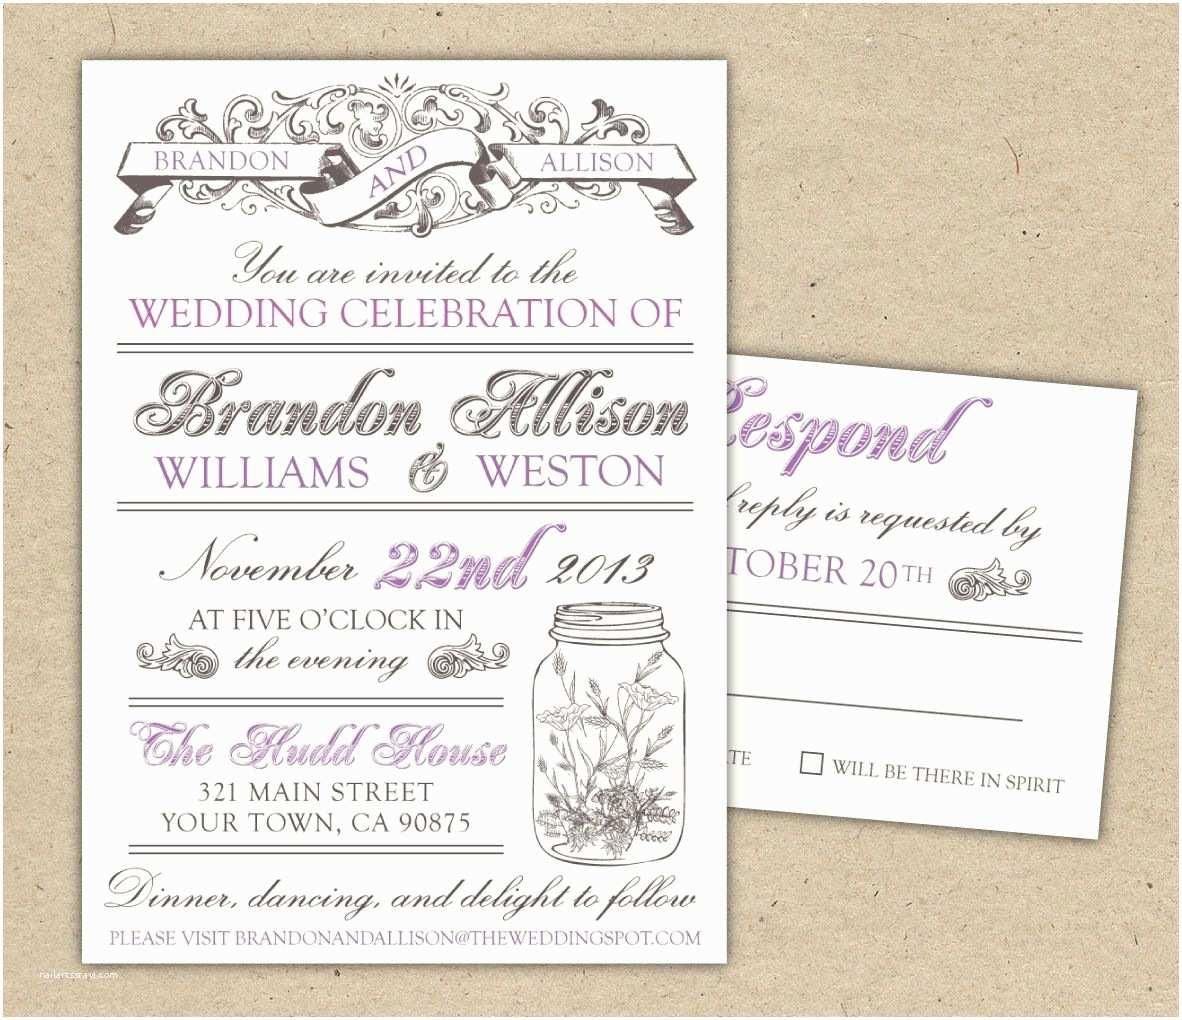 Etsy Wedding Invitation Template Wedding Invitation Template Etsy New Free Templates for